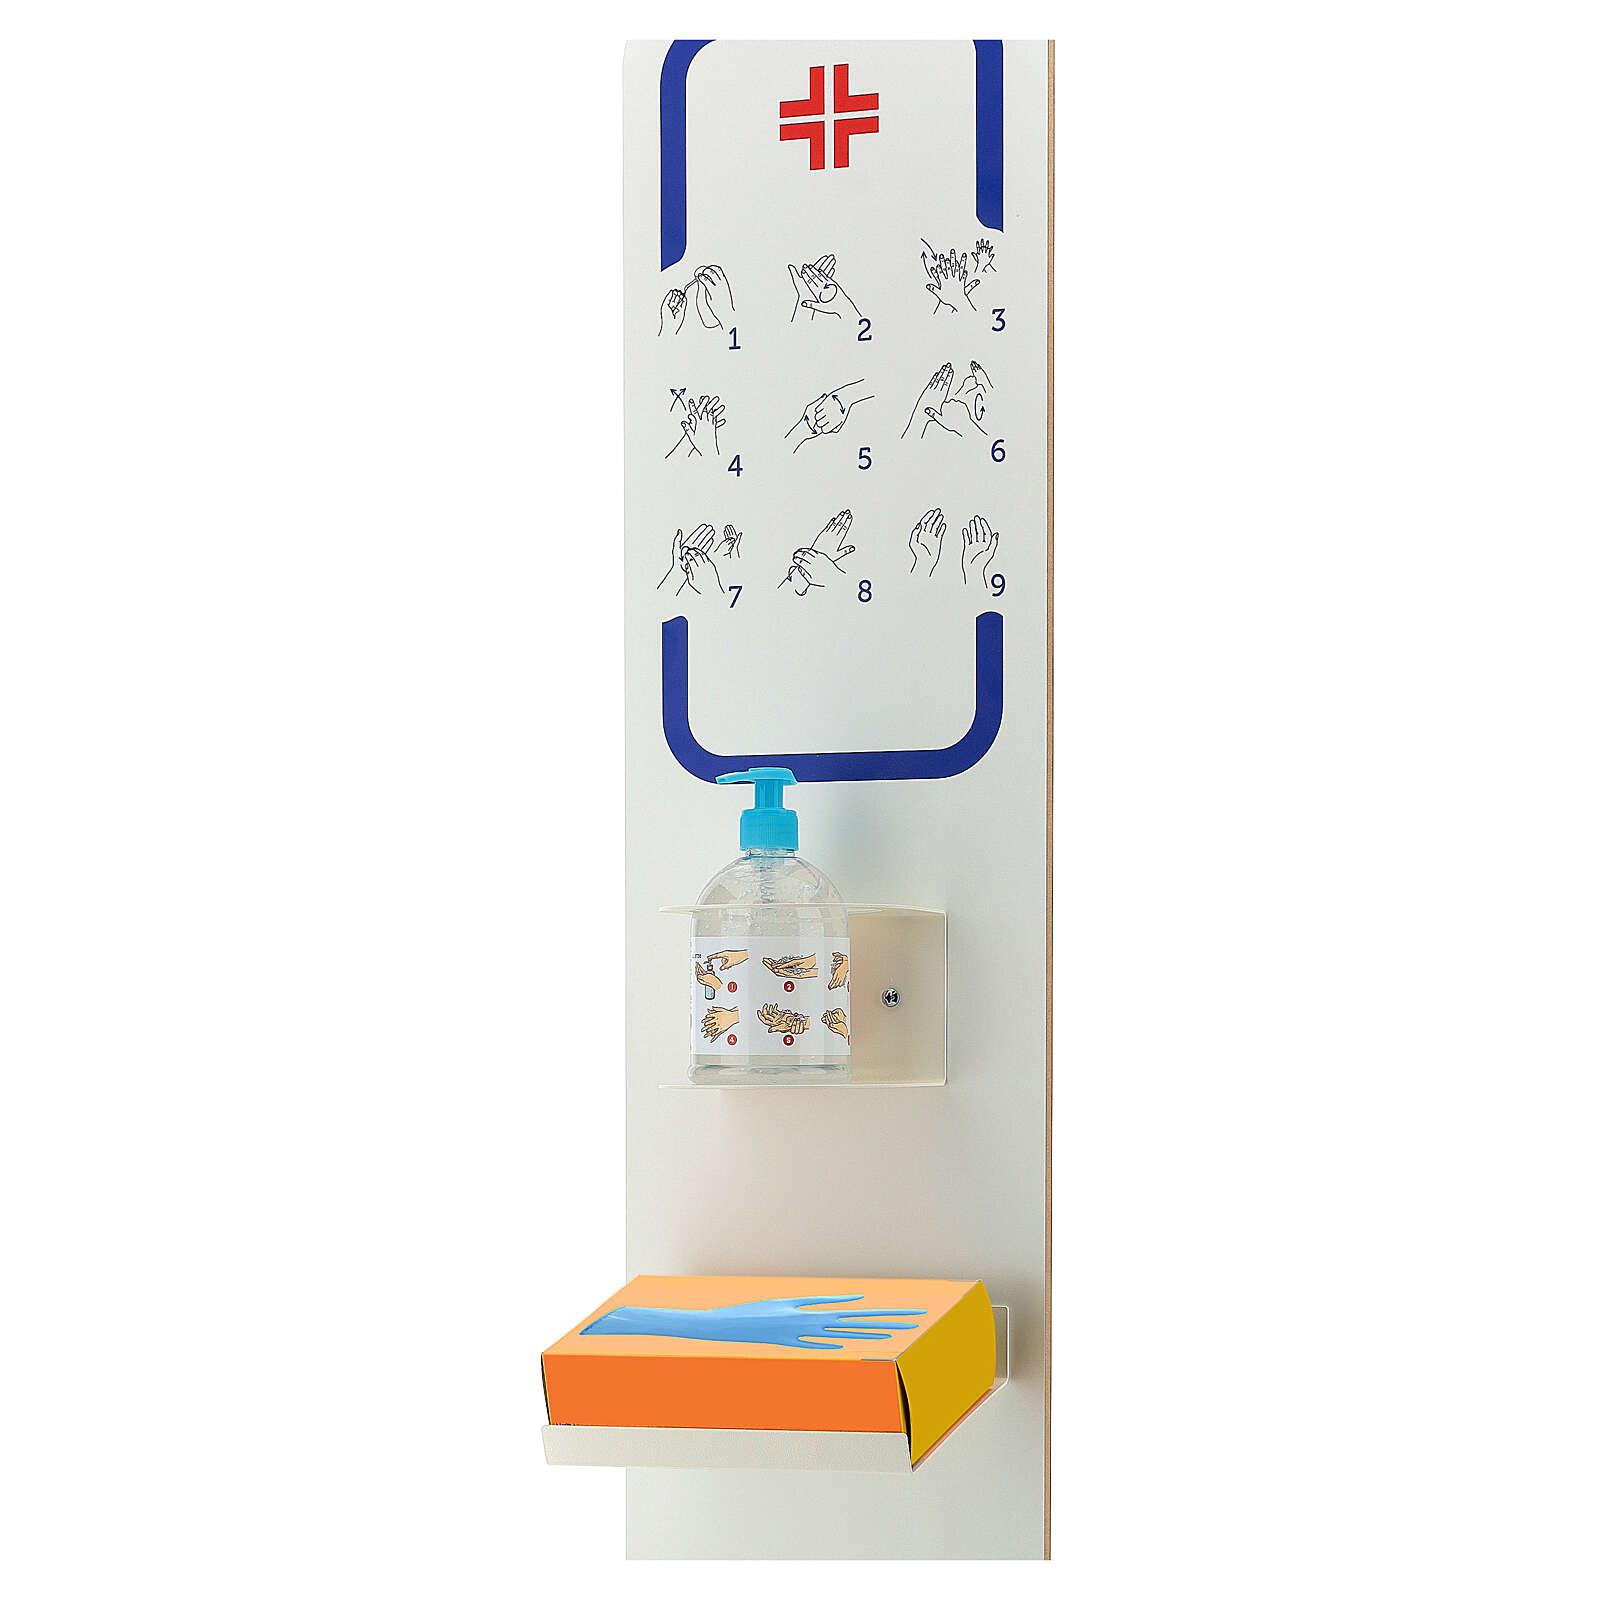 Columna para gel desinfectante anti-contagio 3